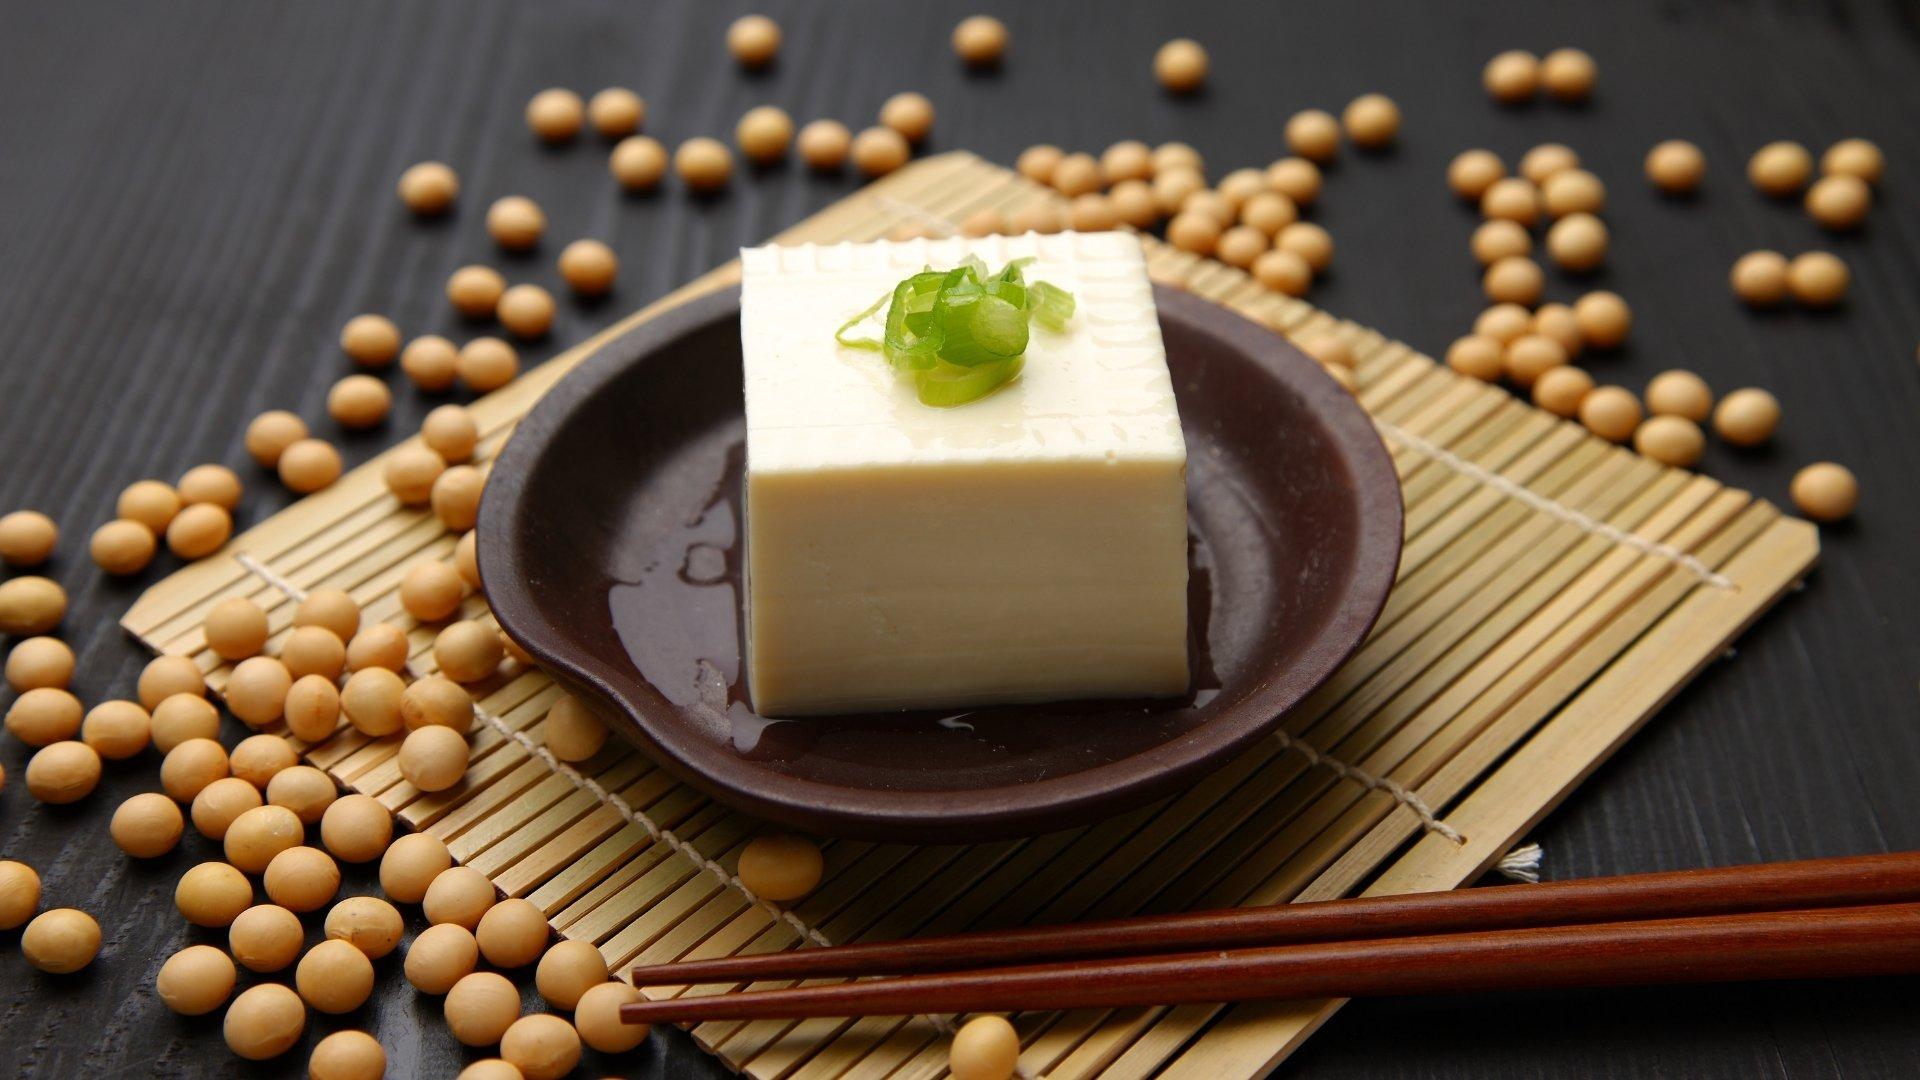 Assuaged-Tofu-Preparation-Image